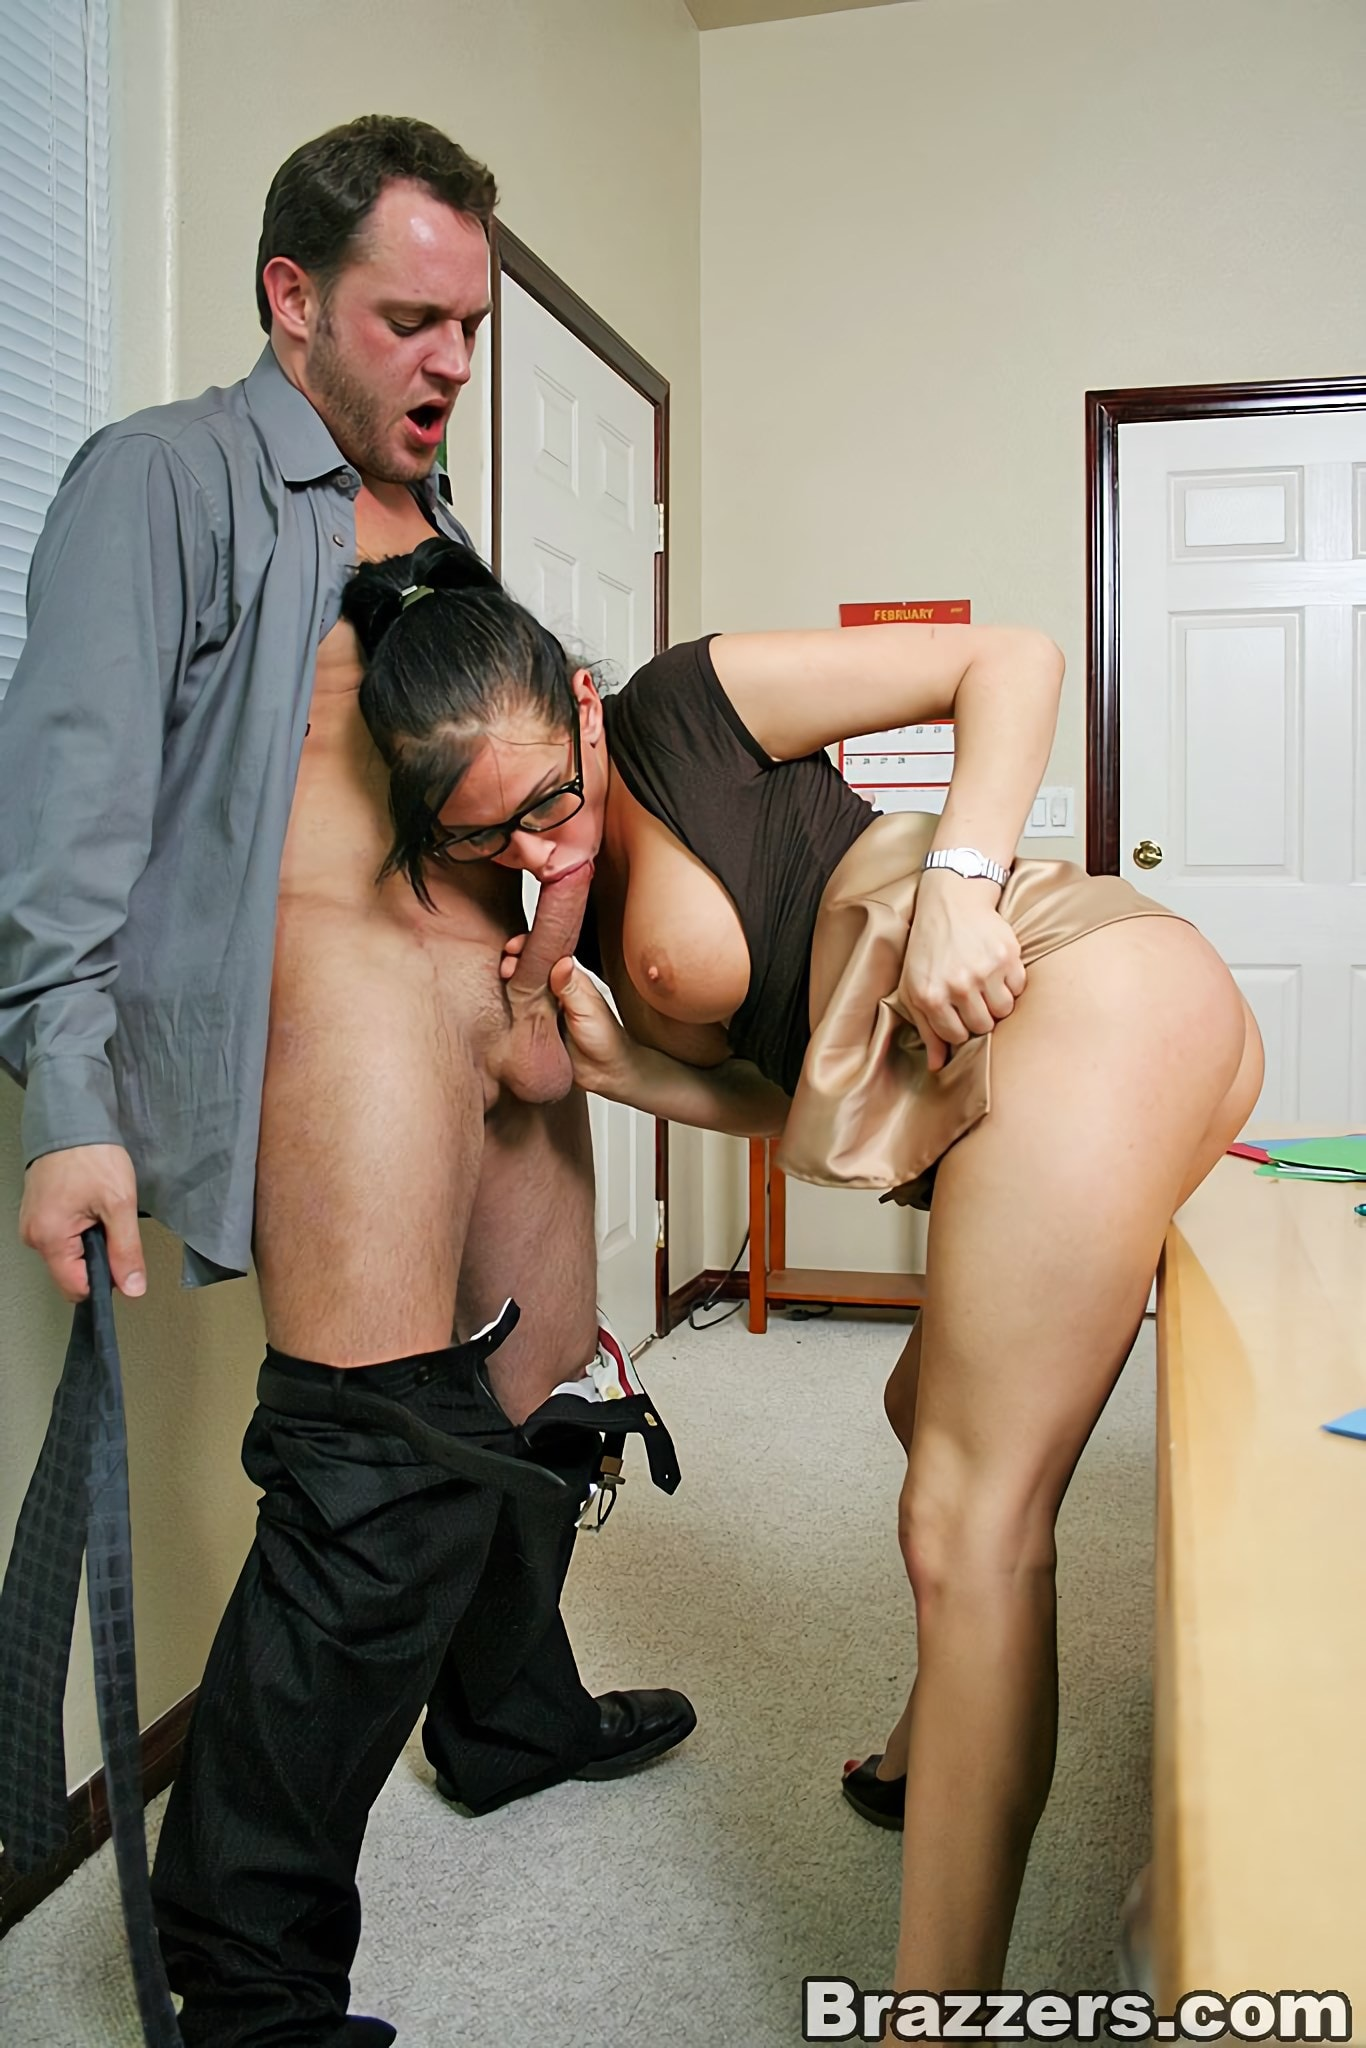 сидят диване, как моя жена трахнулась со своим коллегой на работе порно видео натуру характер сербского